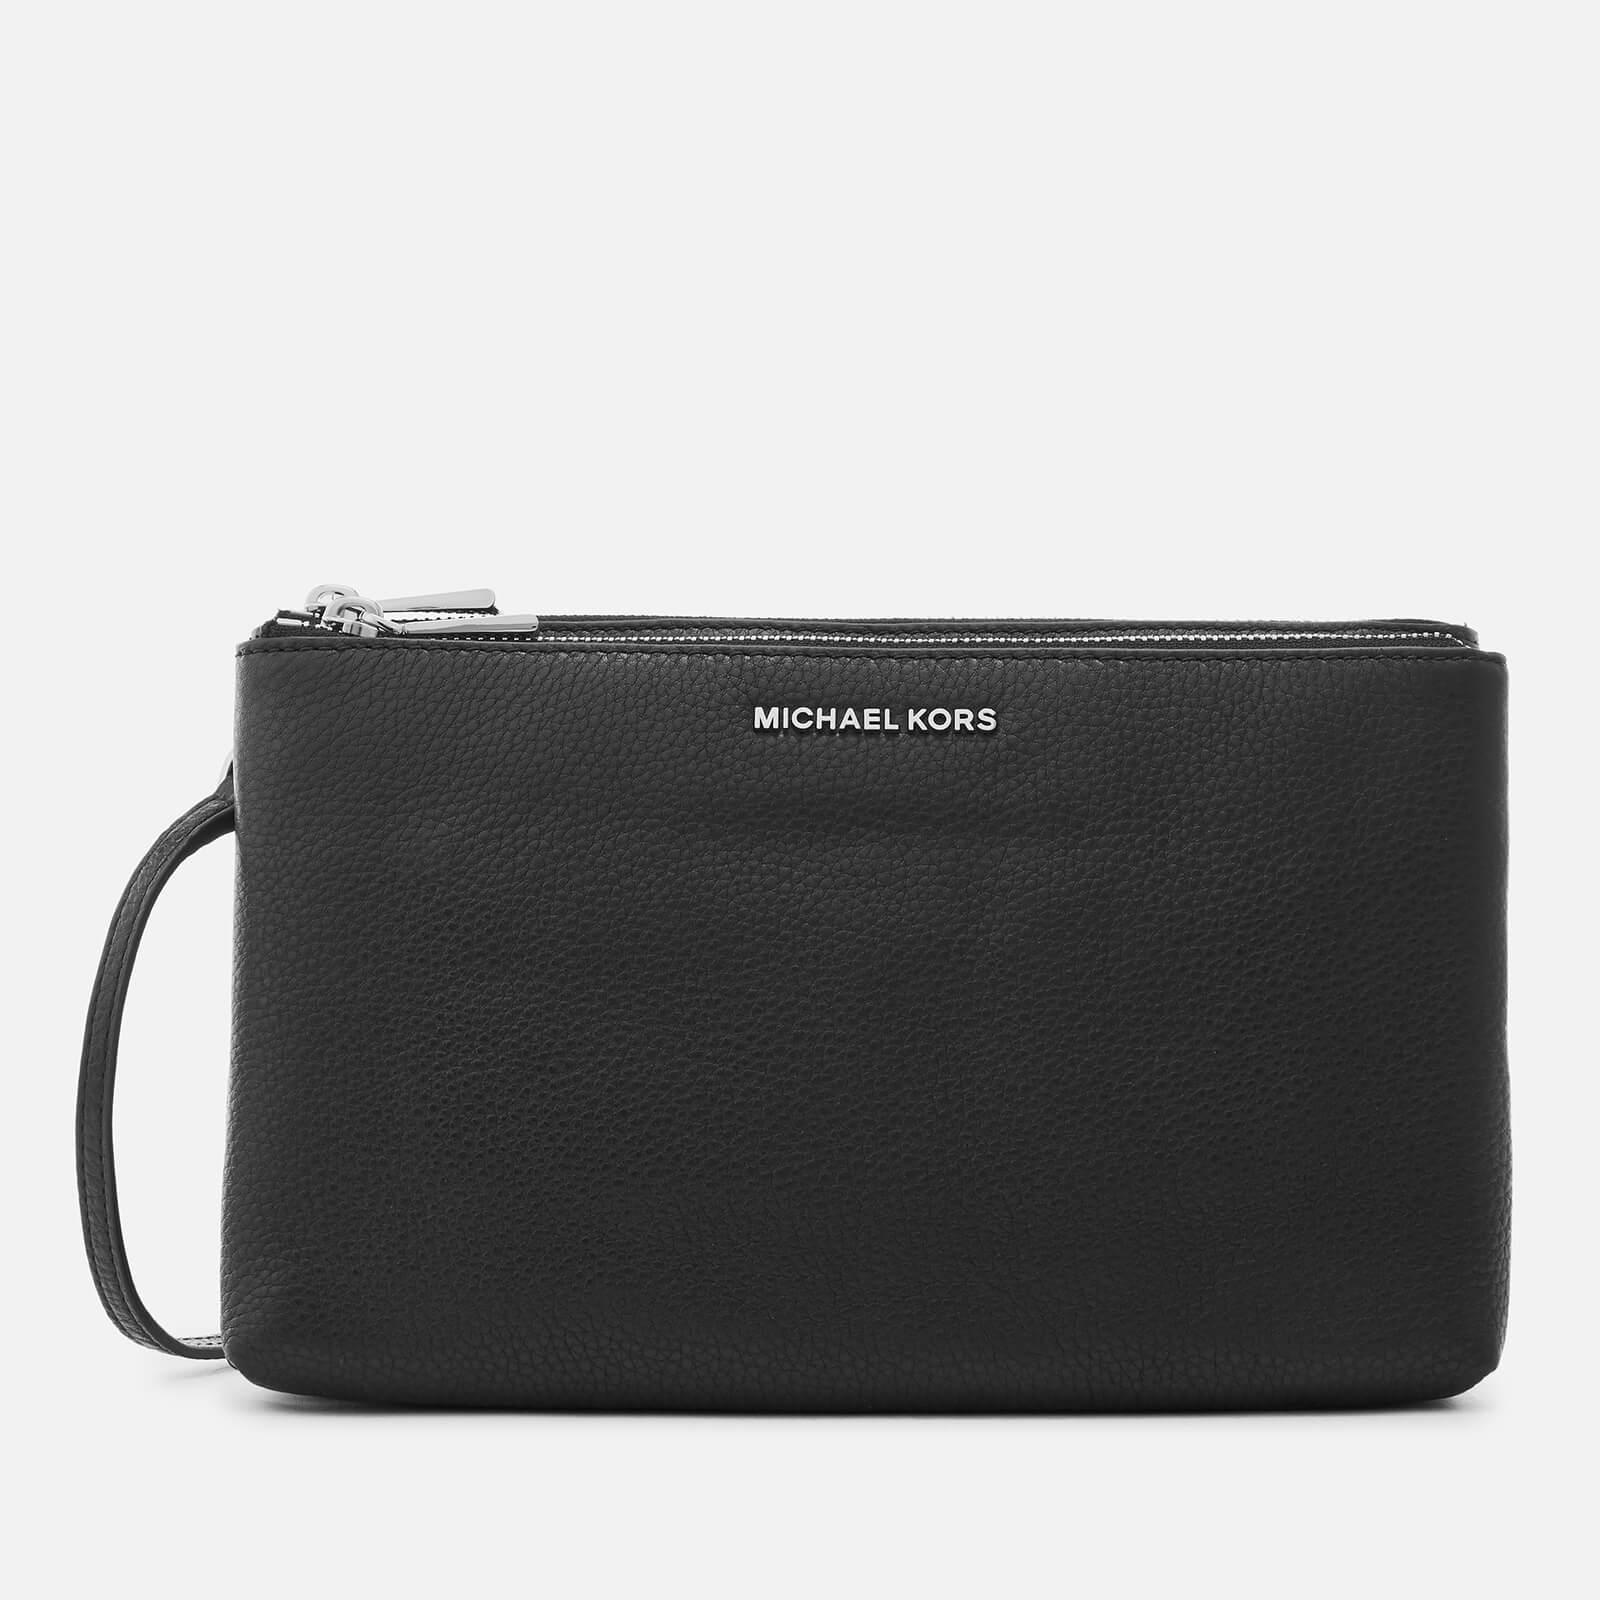 536bba163f0edc MICHAEL MICHAEL KORS Women's Adele Double Zip Cross Body Bag - Black - Free  UK Delivery over £50